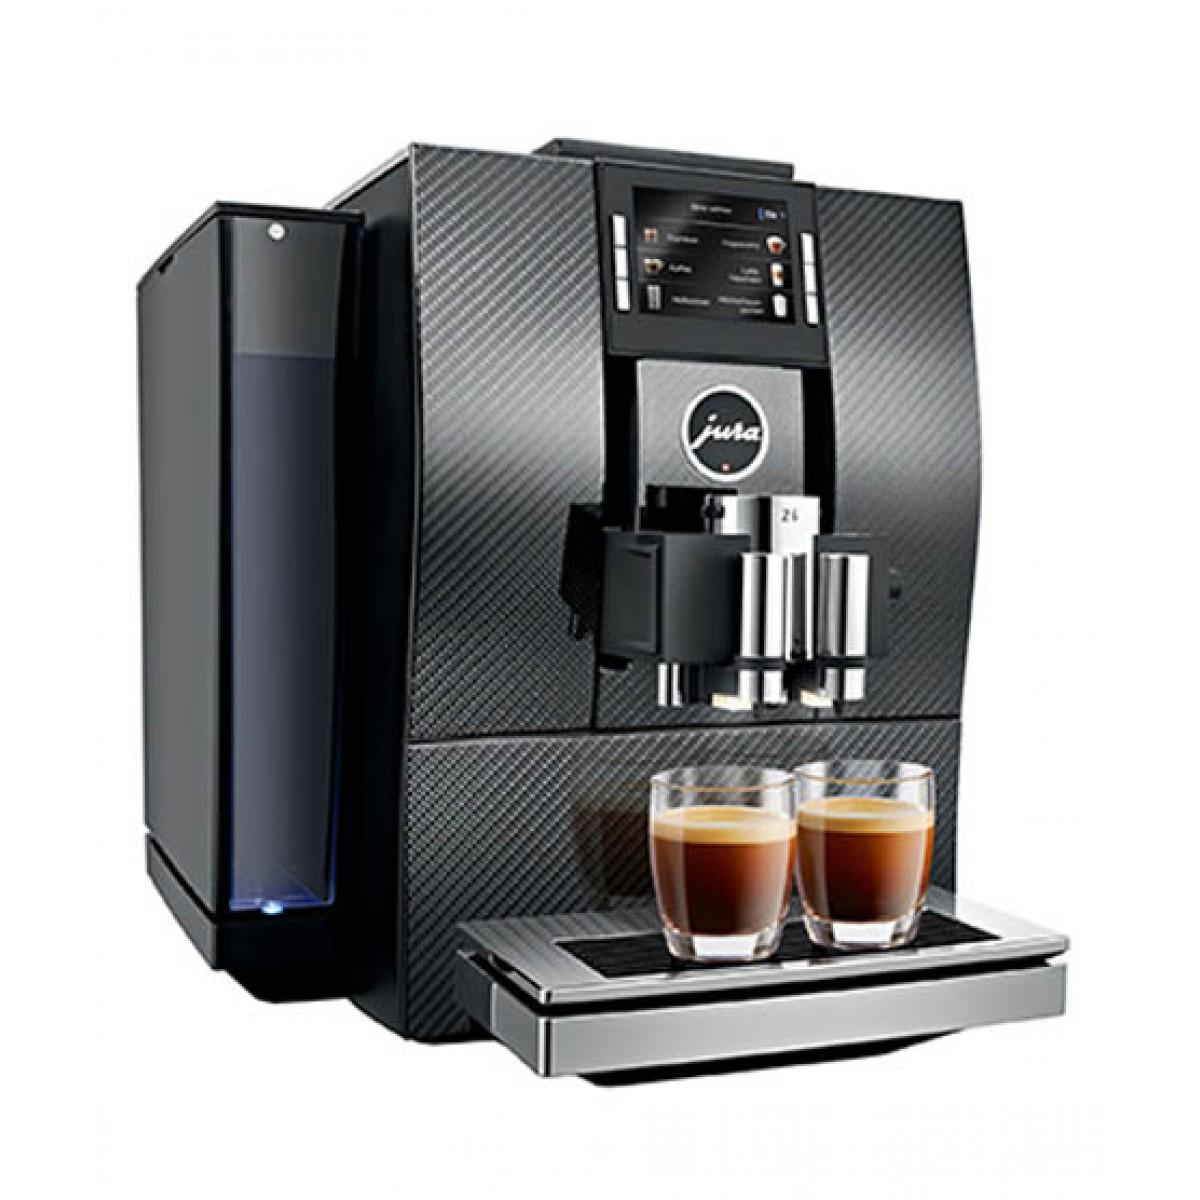 Jura Coffee Machine Price in Pakistan | Buy Jura Impressa ...